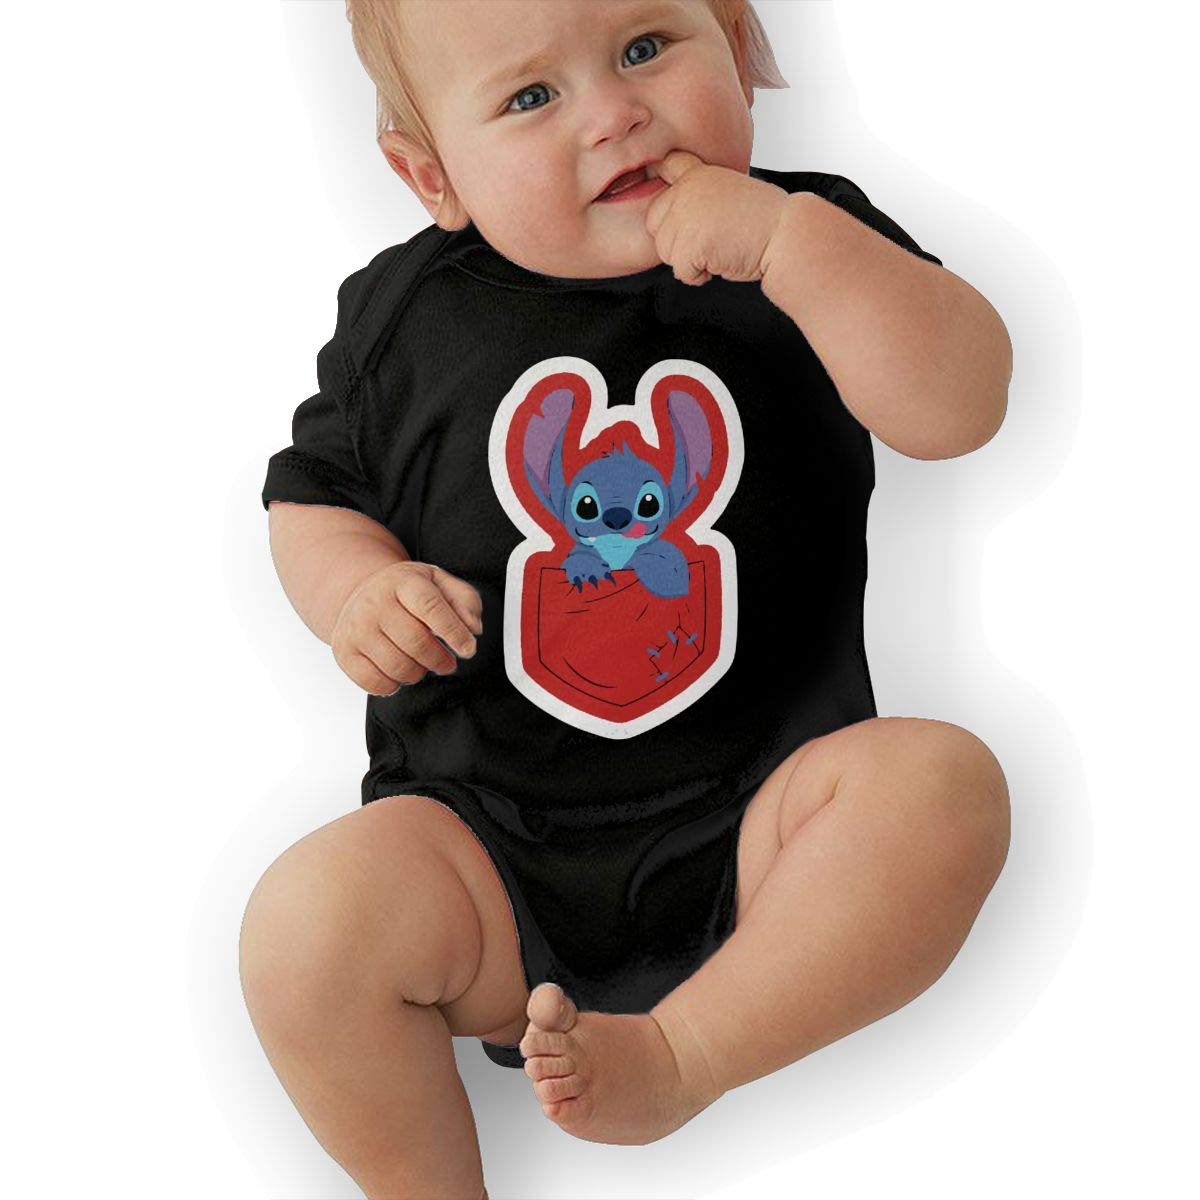 TAOHJS97 Baby Girls Alien Pocket 1 Short Sleeve Climbing Clothes Bodysuits Suit 6-24 Months